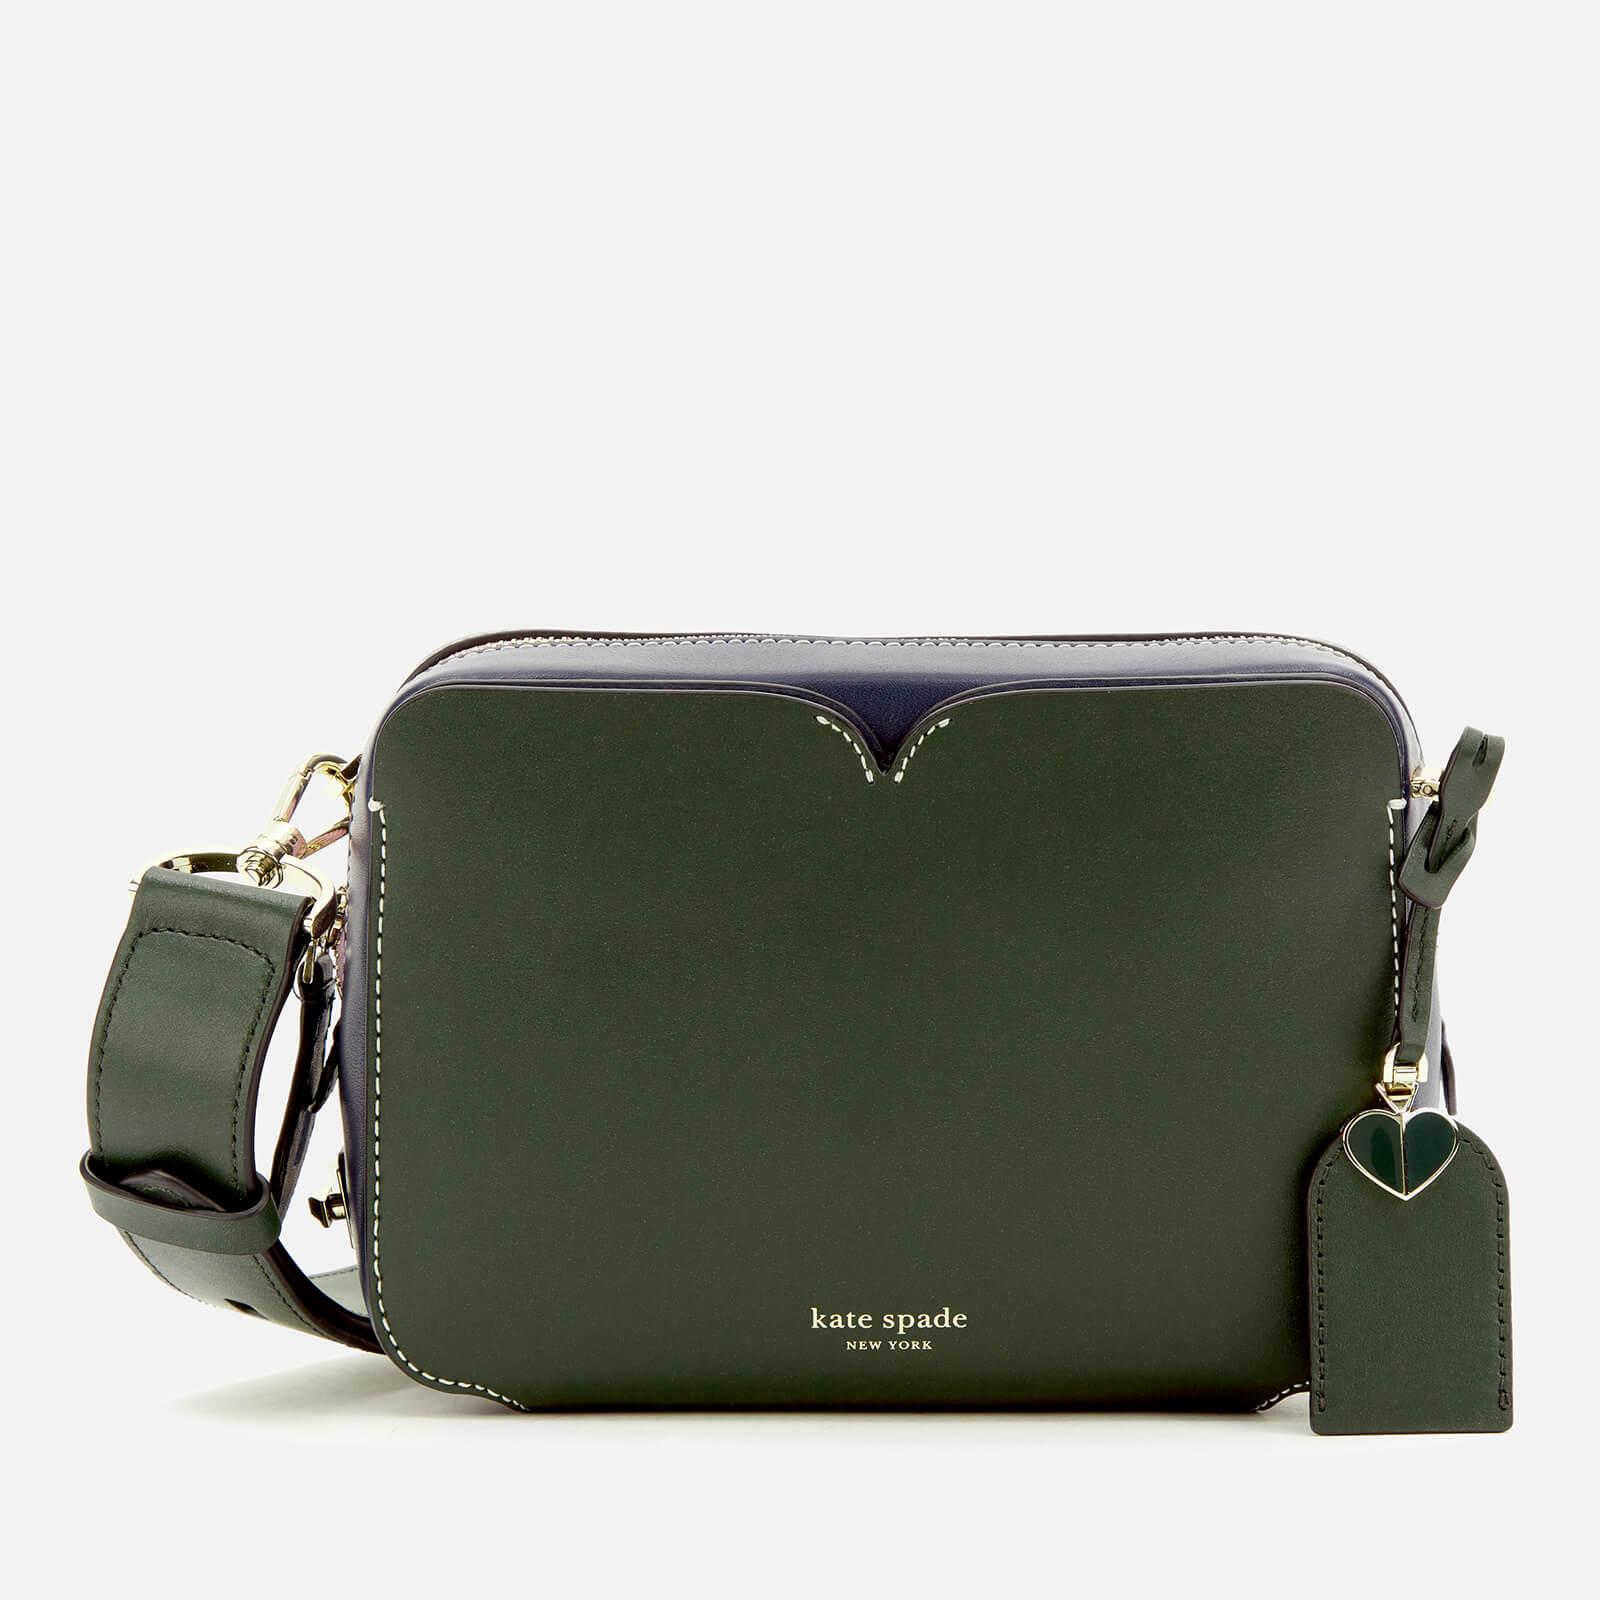 Kate Spade New York Women S Candid Medium Camera Bag Deep Evergreen